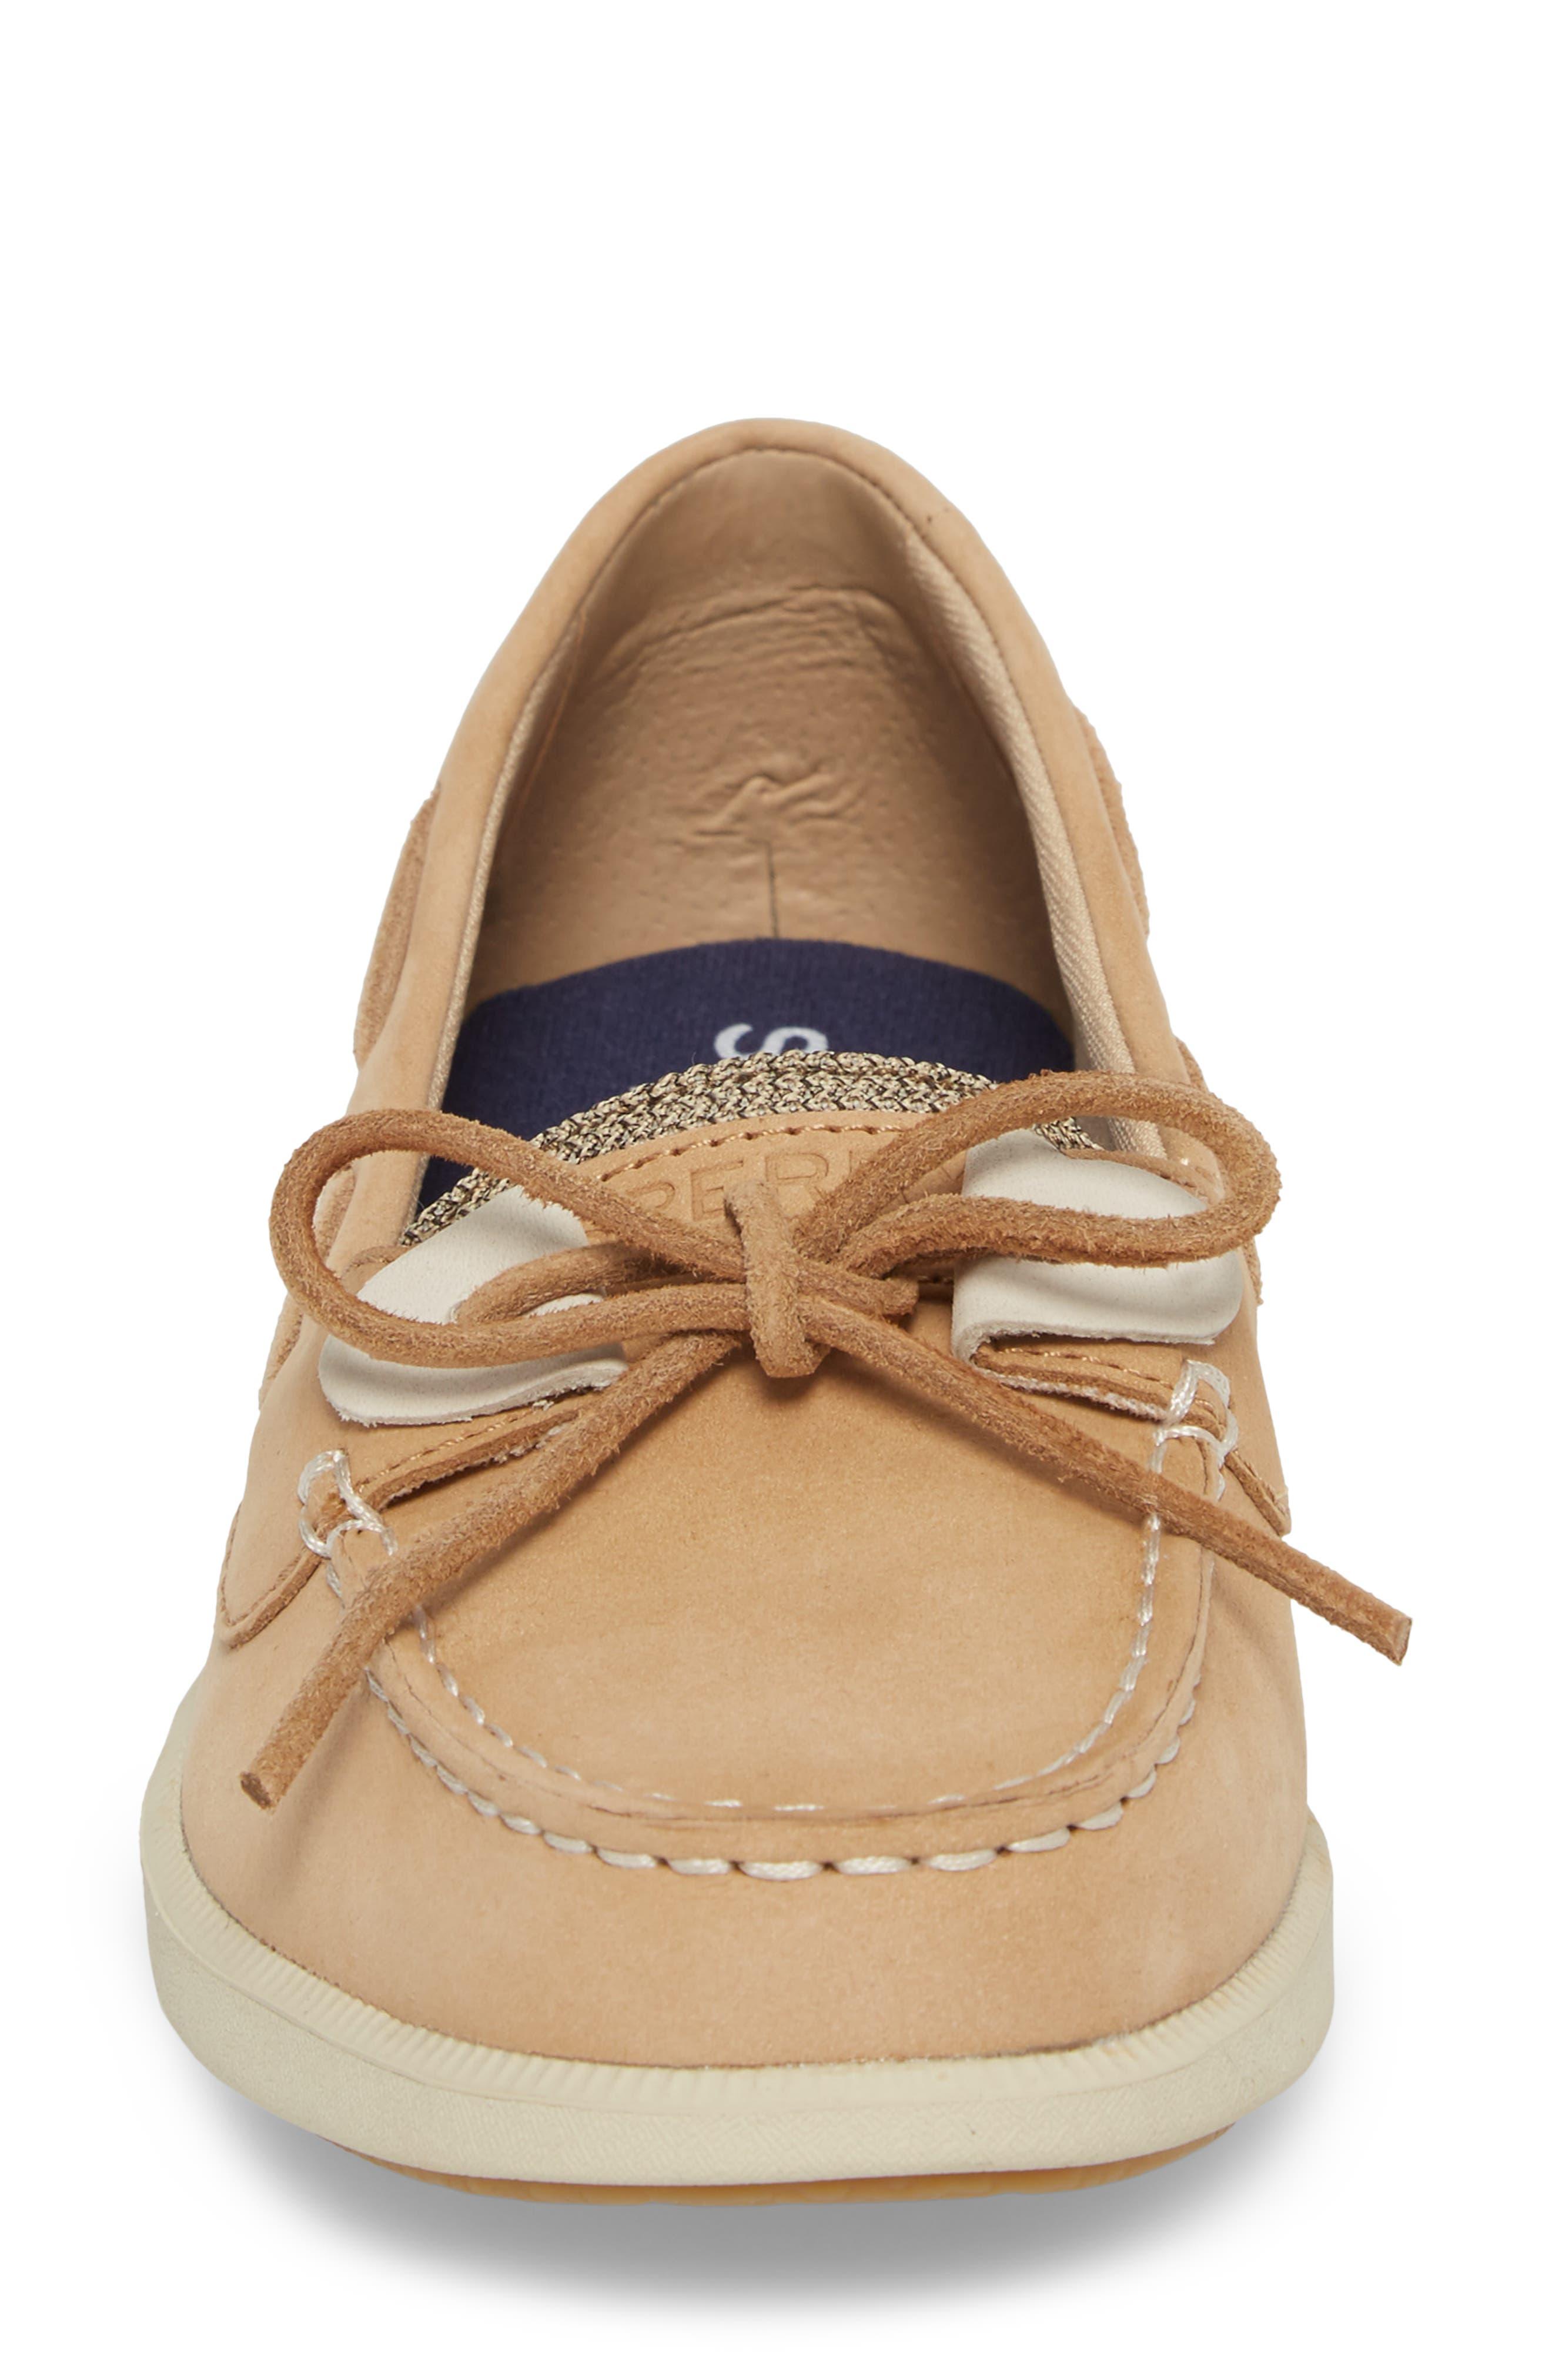 Oasis Boat Shoe,                             Alternate thumbnail 4, color,                             LINEN OAT LEATHER